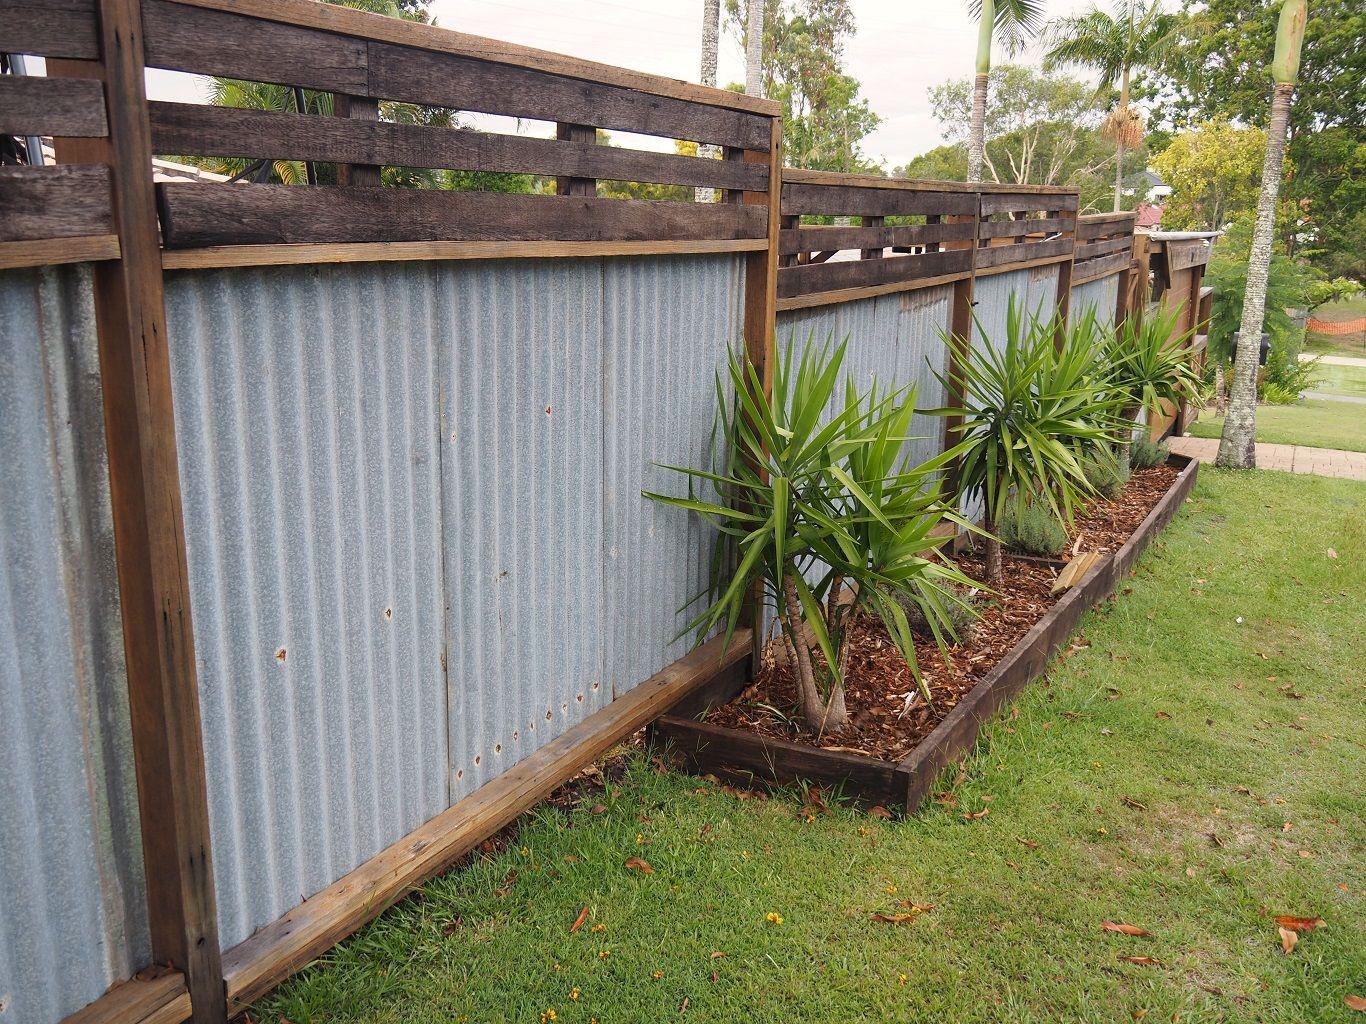 Corrugated Metal Privacy Fence | Metal Design & Decor